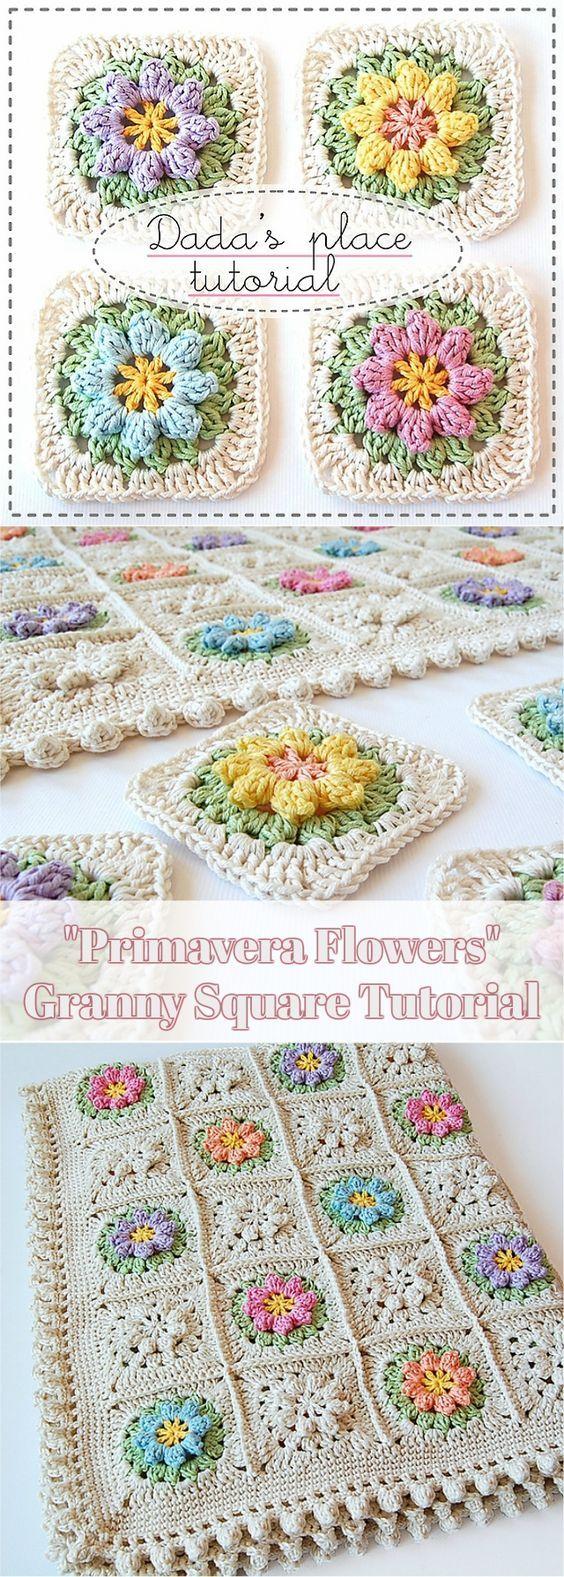 Primavera Flowers Granny Square [Free Crochet Pattern + Photo Tutorial] #crochet #grannysquare #freepattern #decor #craft #artwork